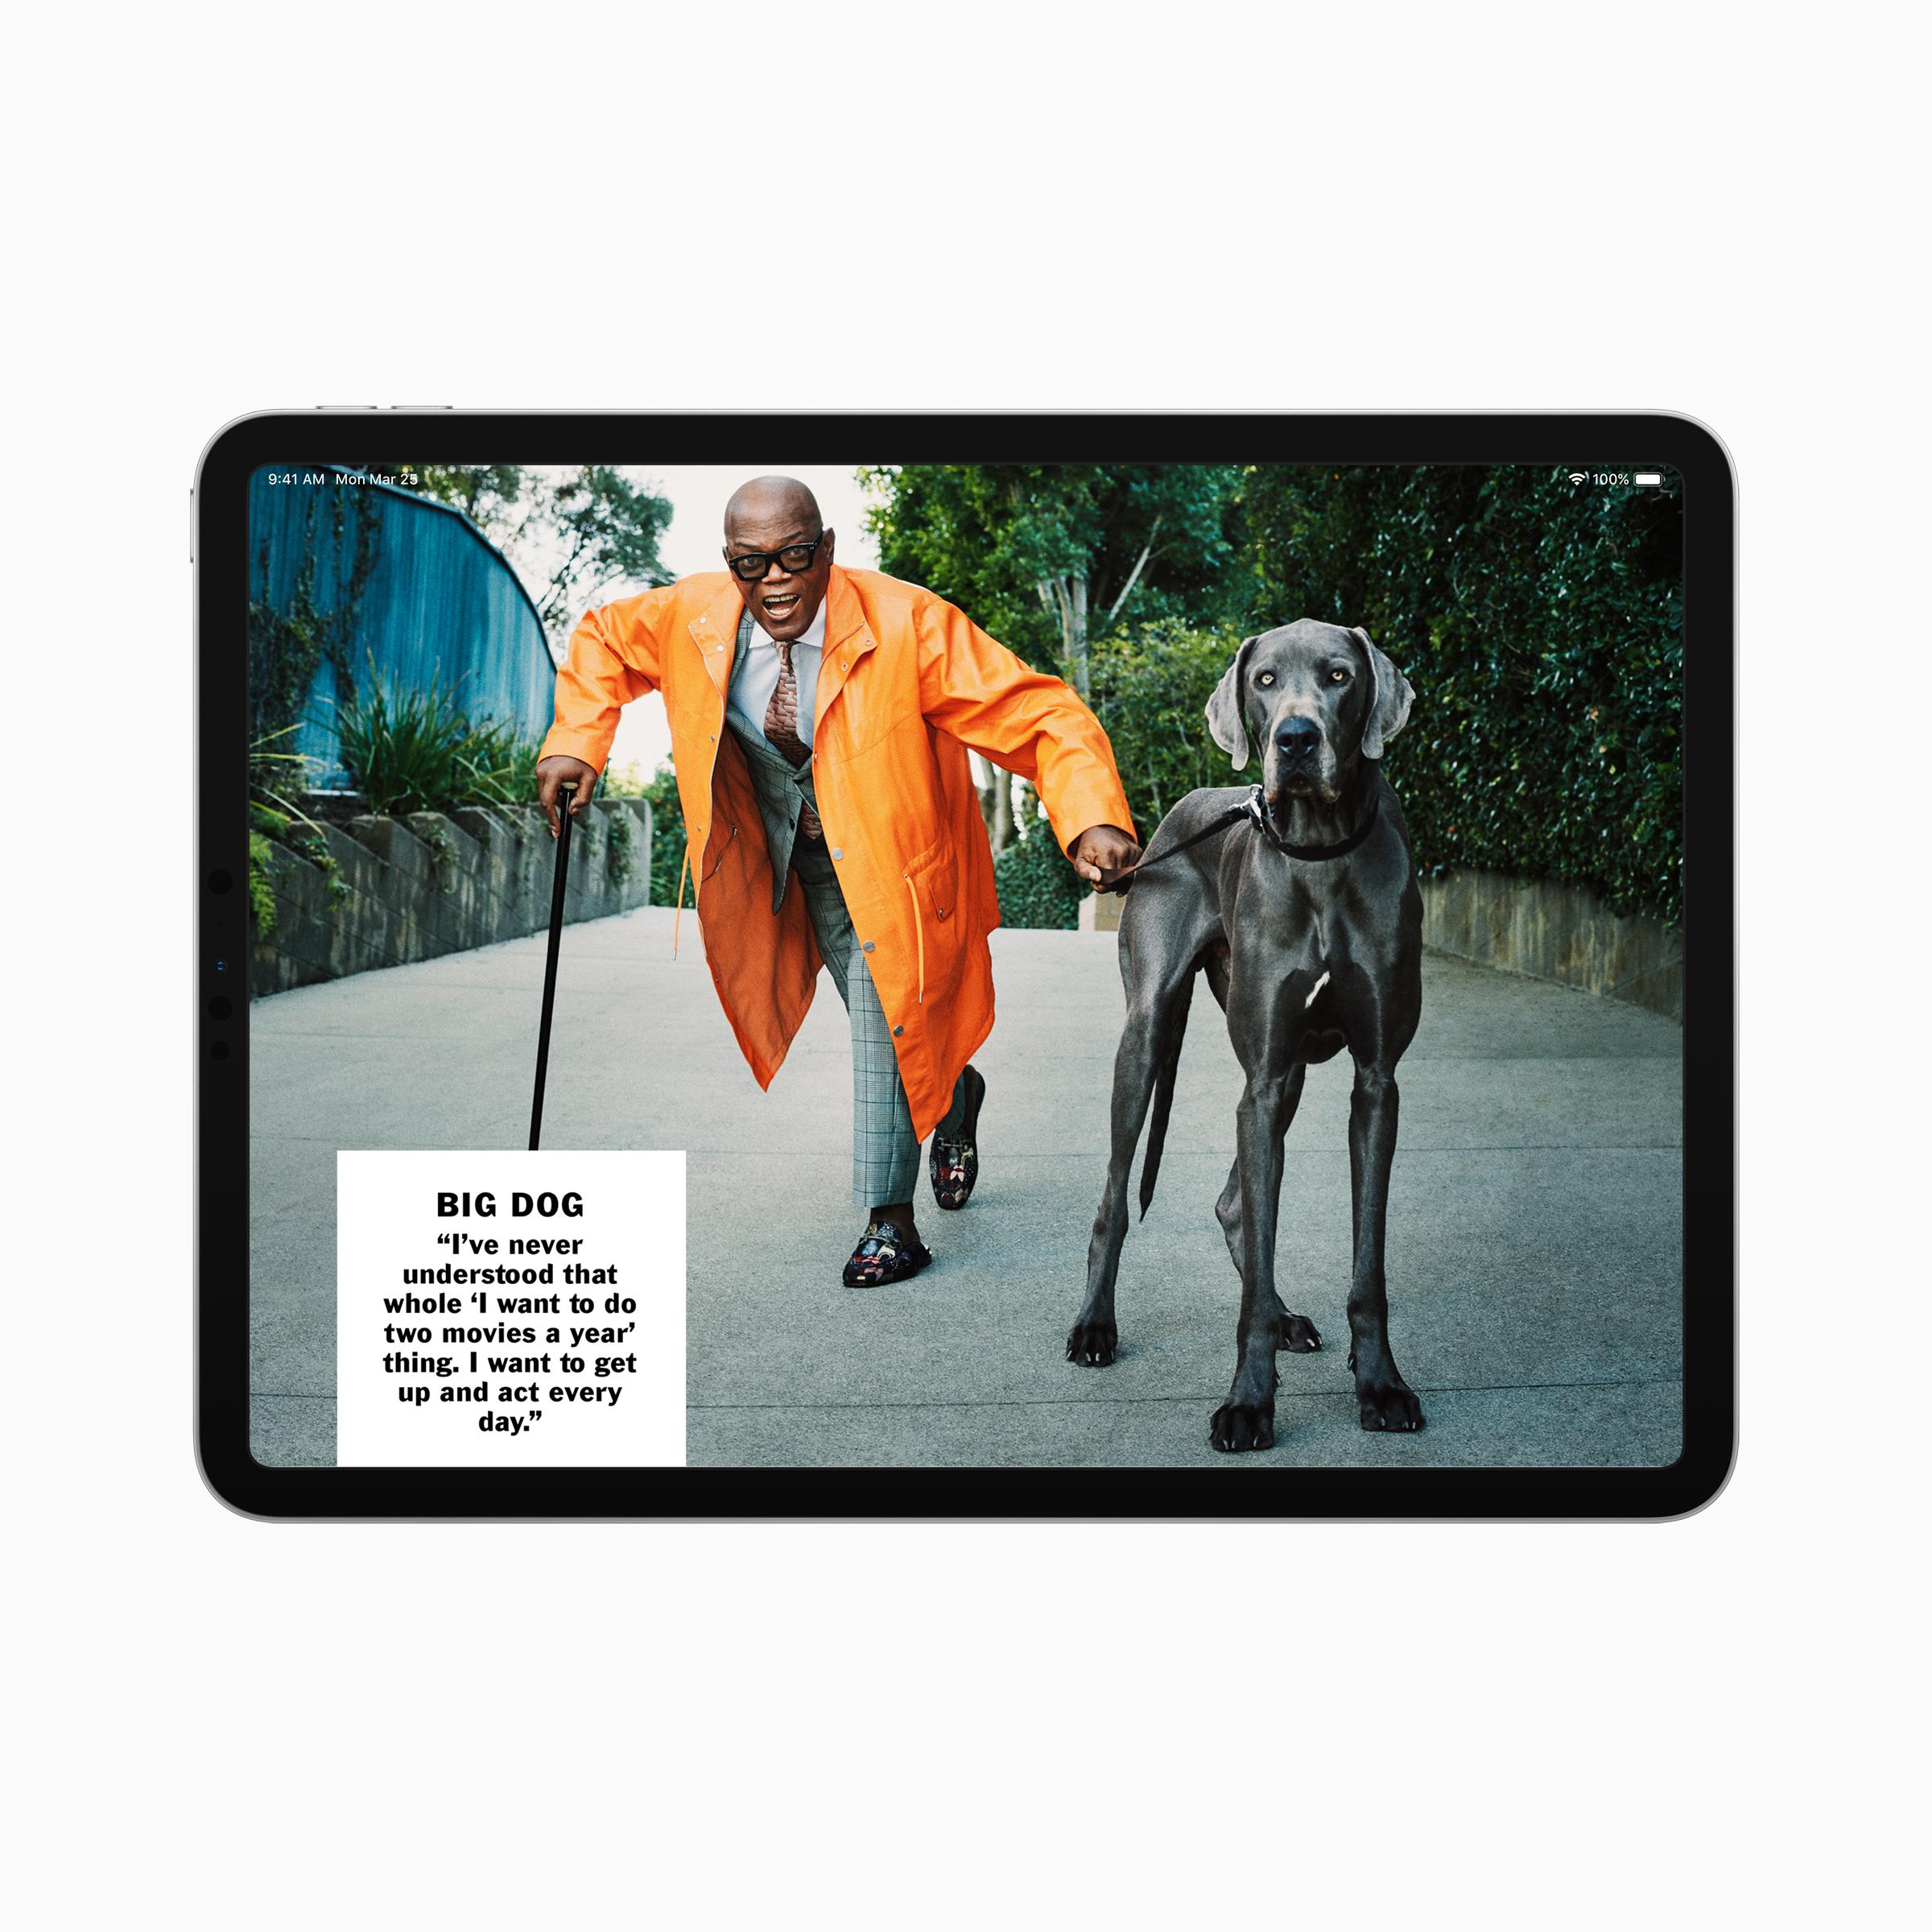 Apple news plus esquire ipad screen 03252019